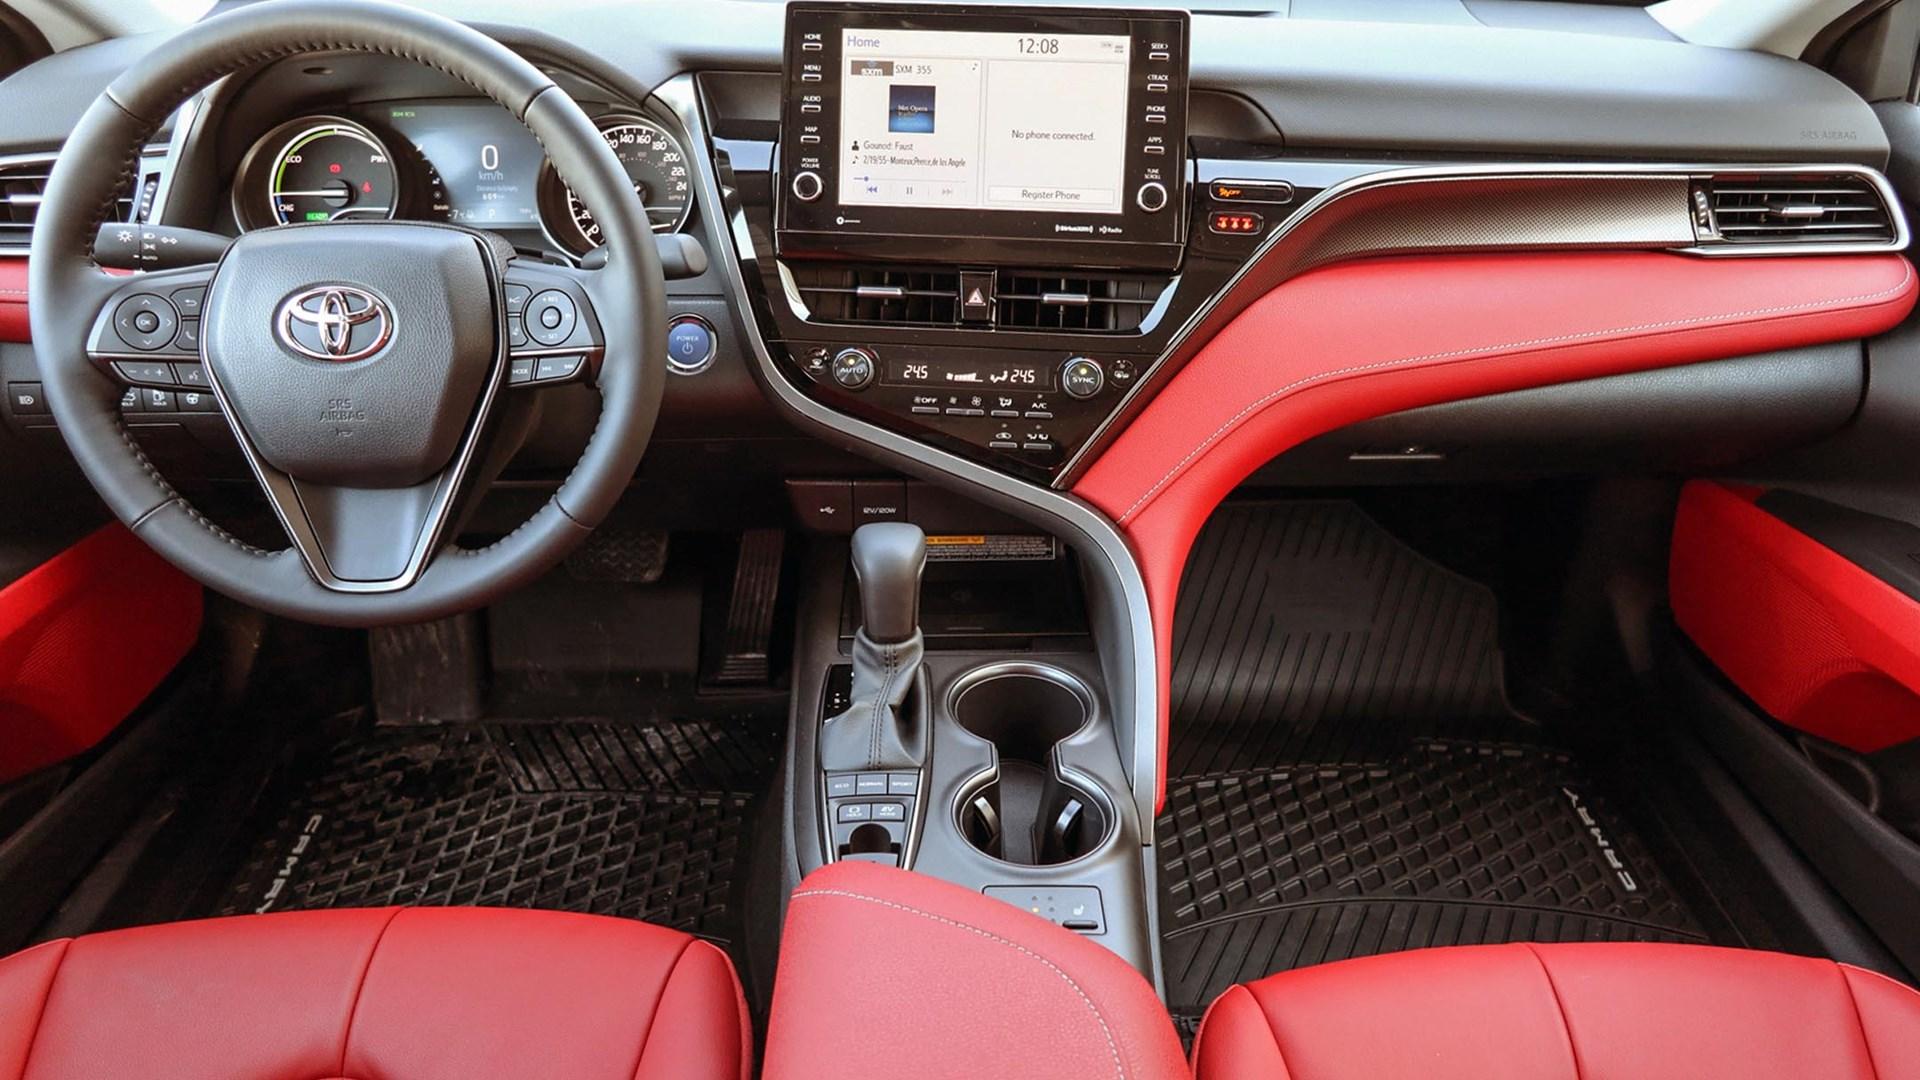 2021-toyota-camry-hybrid interior